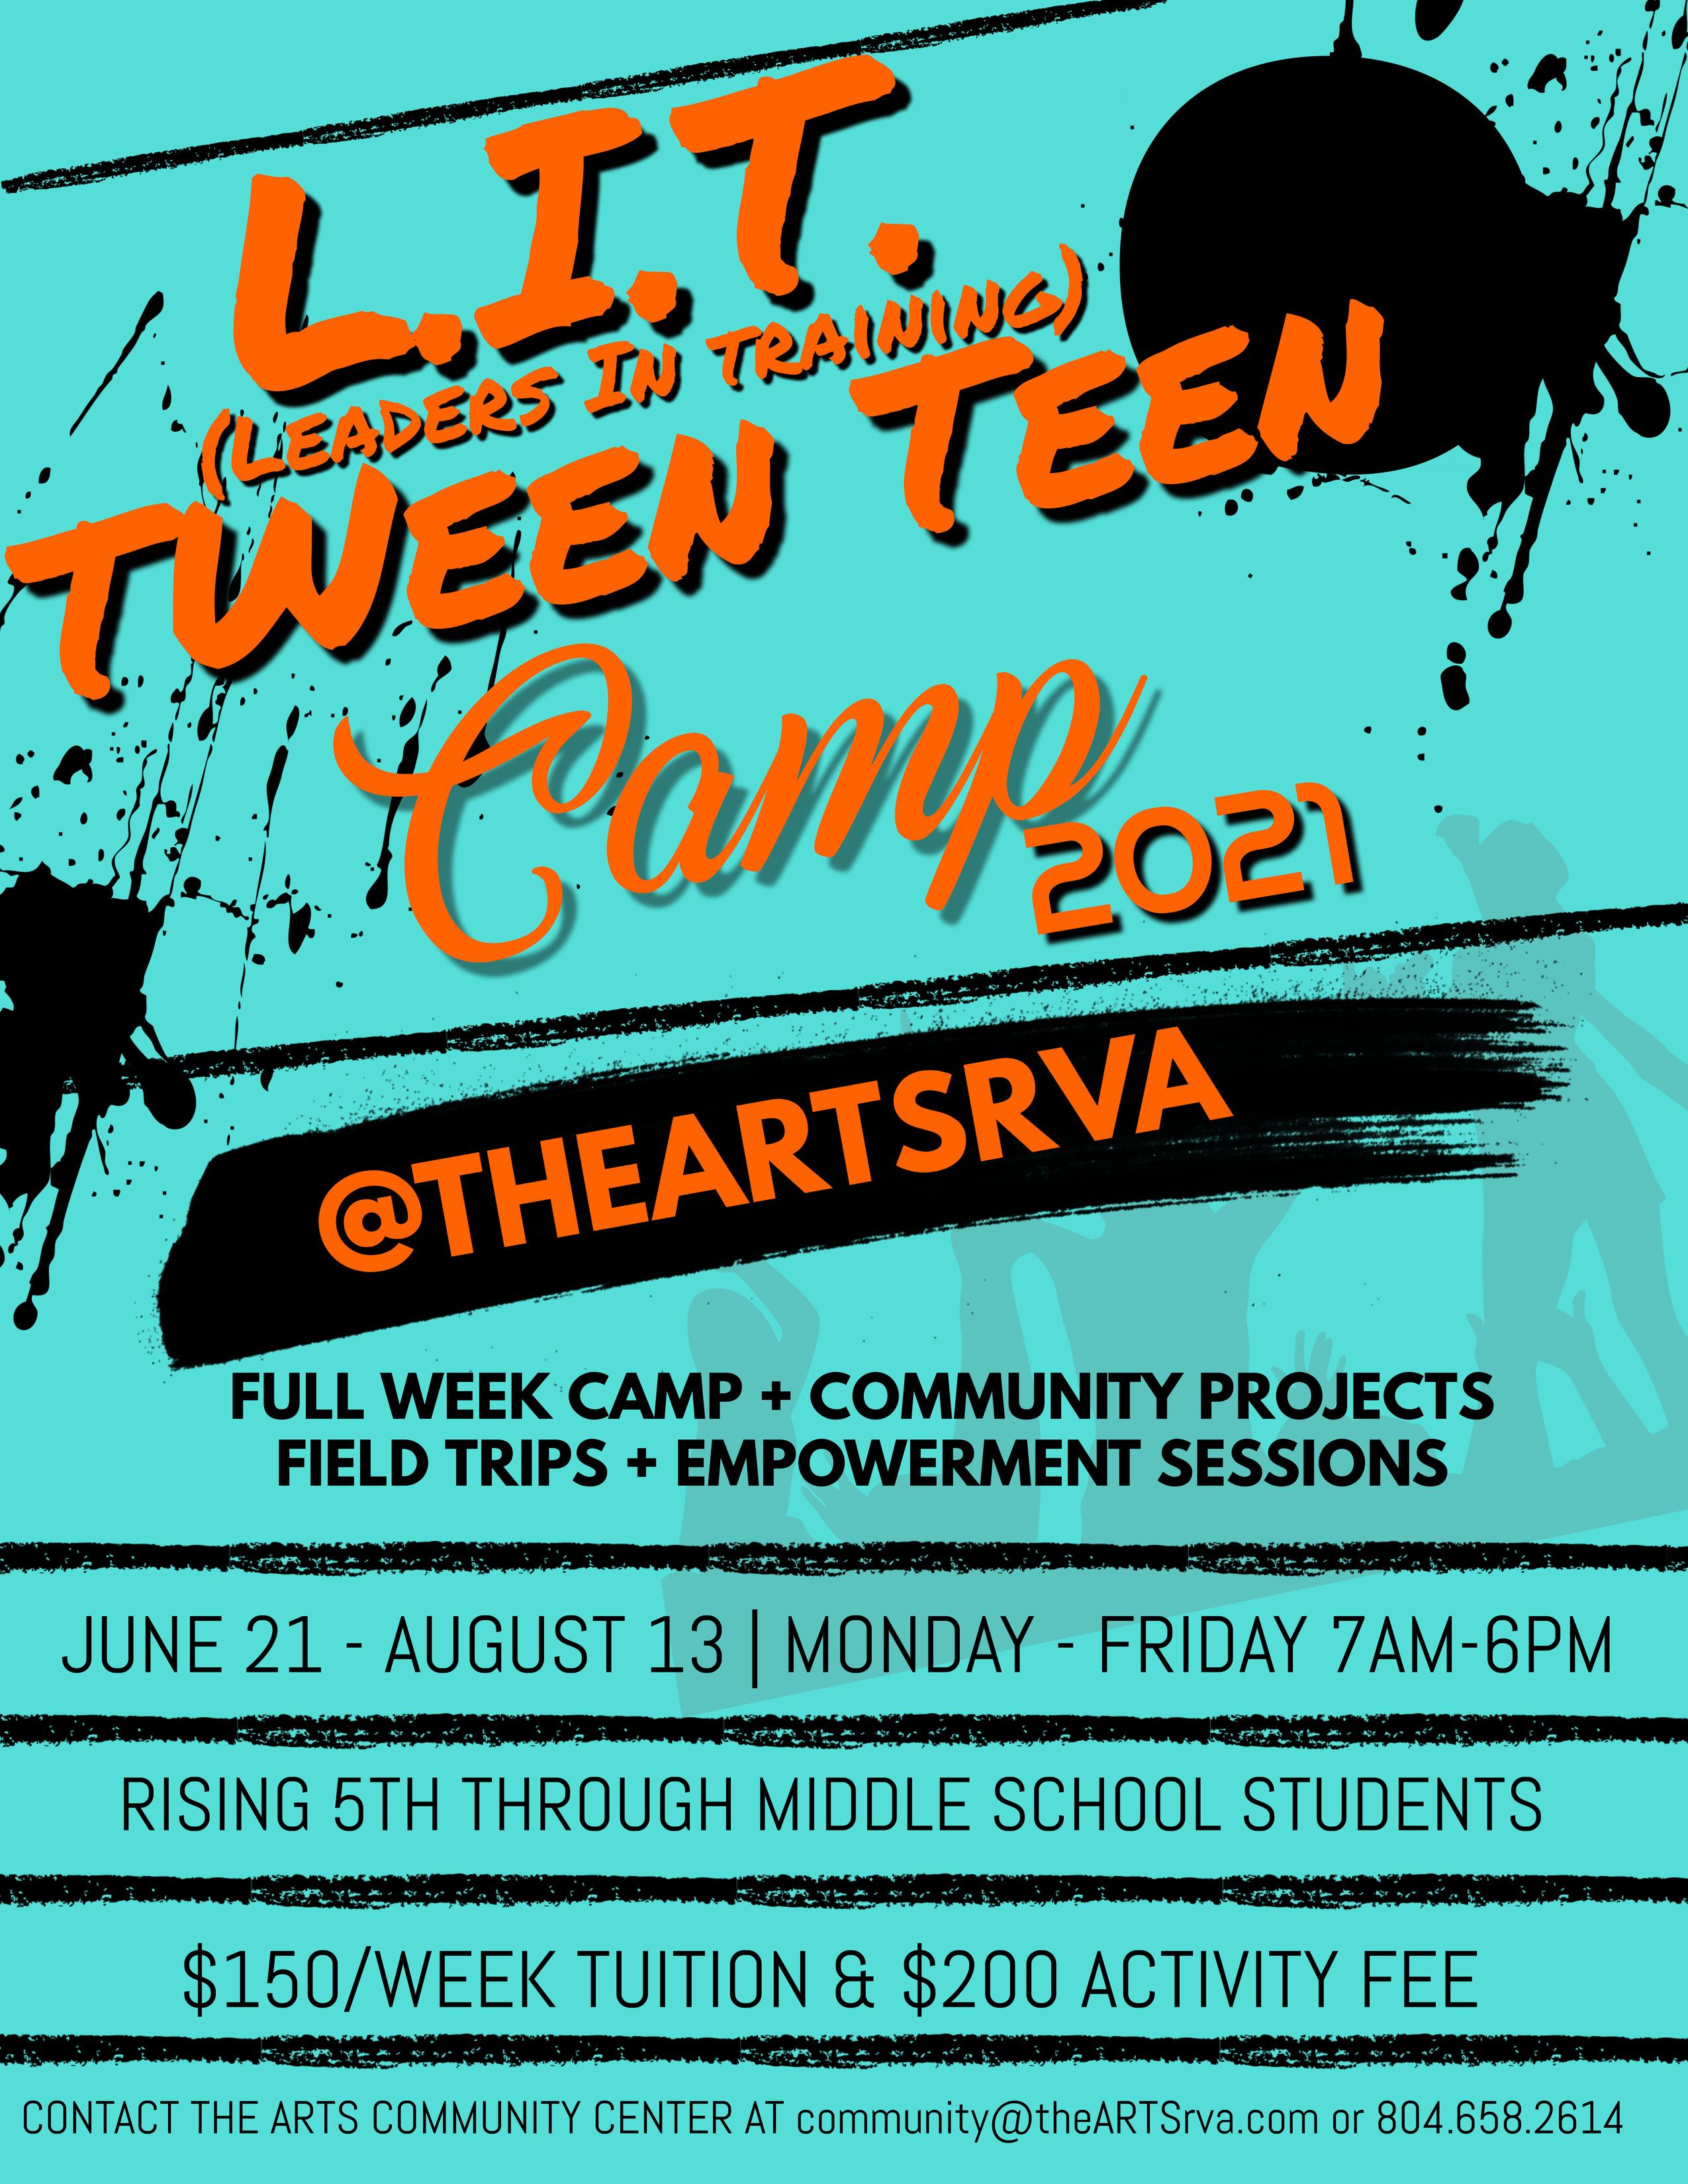 TWEEN TEEN CAMP 2021 revised (1)